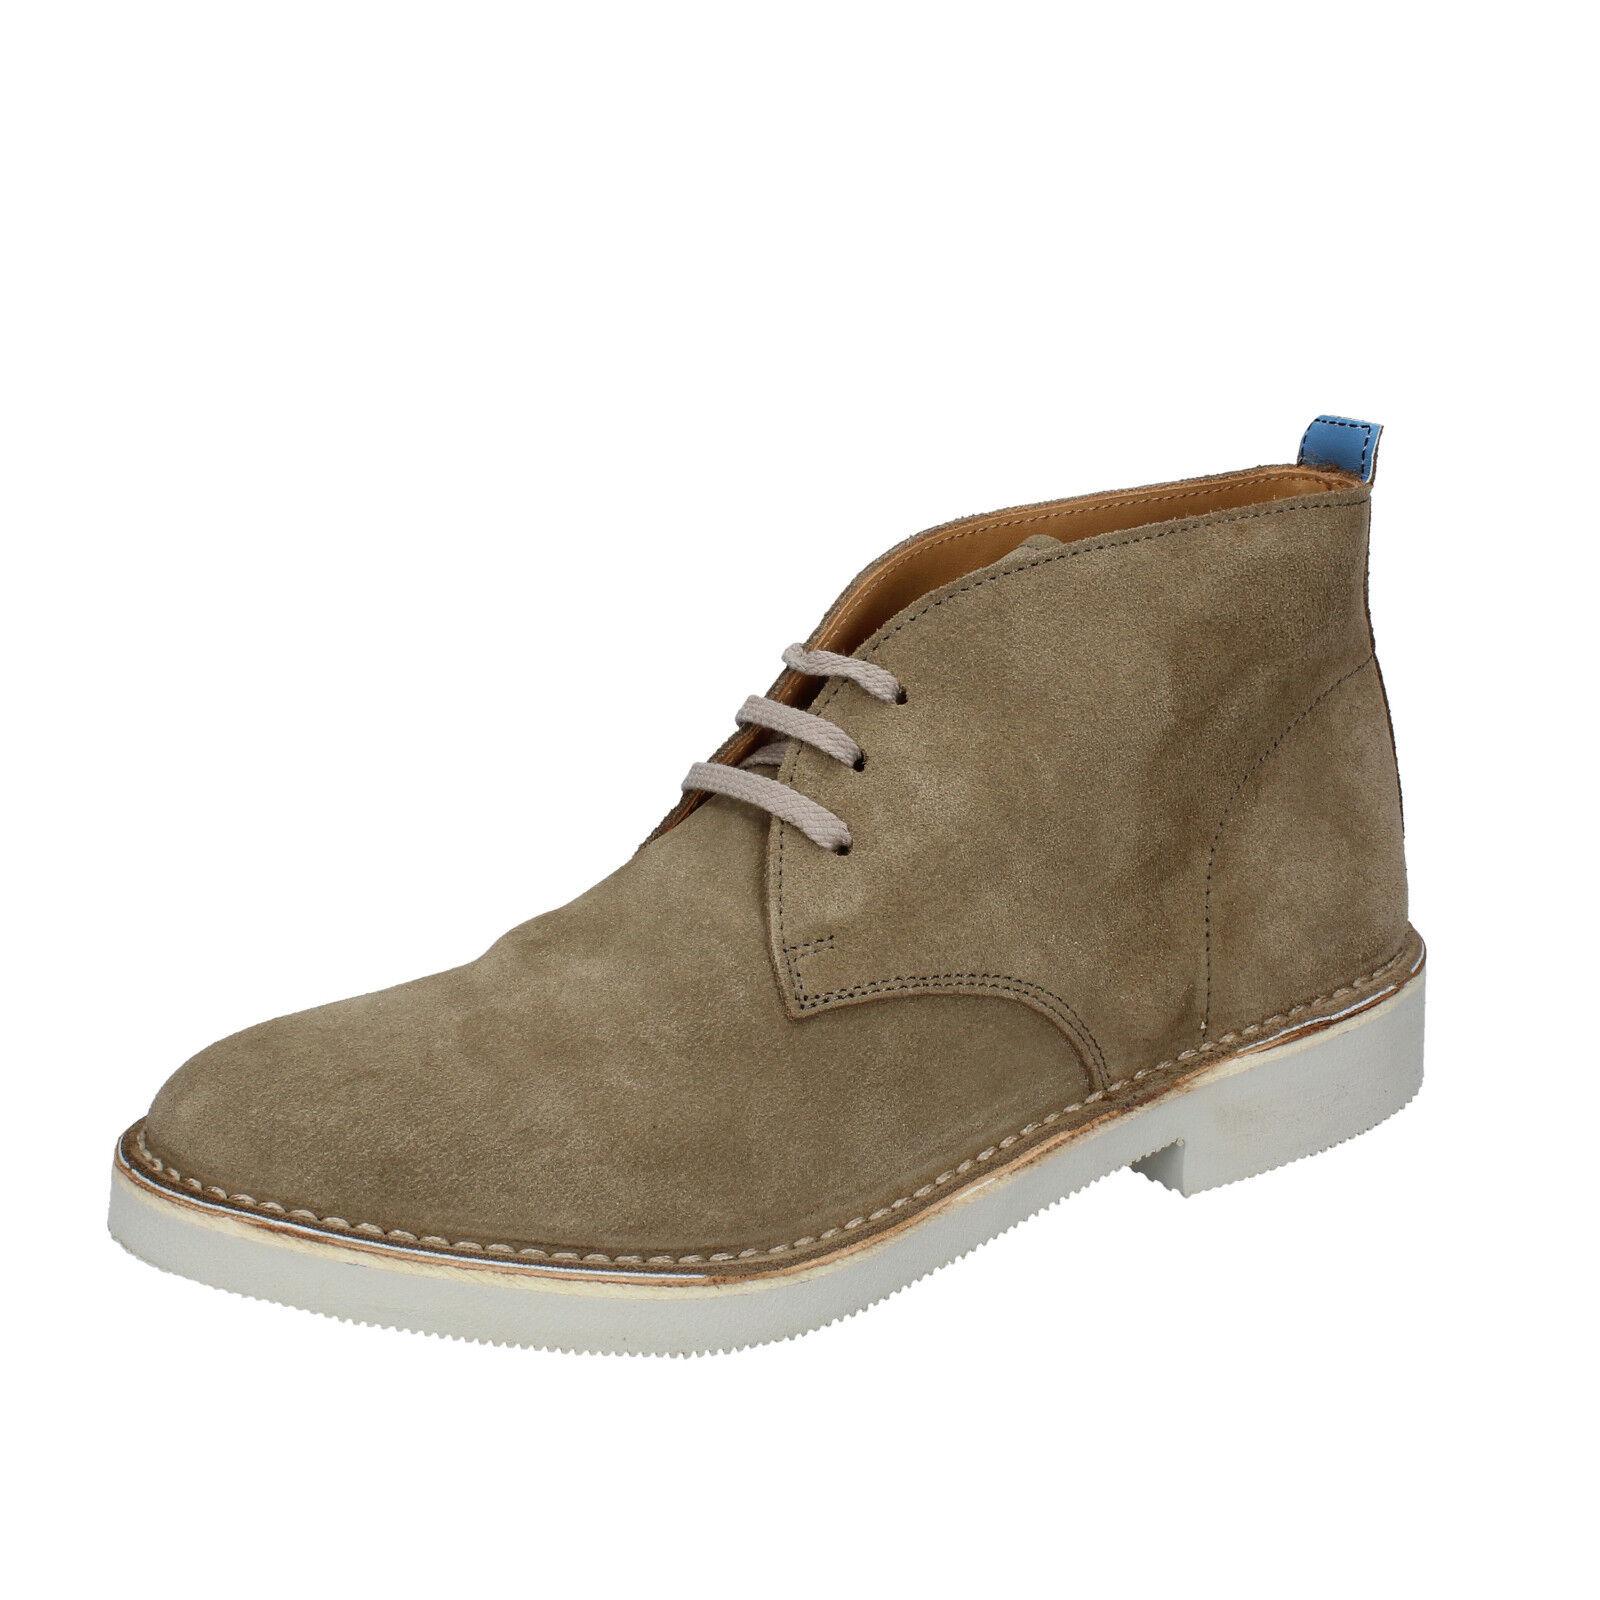 Men's chaussures MOMA 10 (EU 43) desert bottes vert suede AB428-43